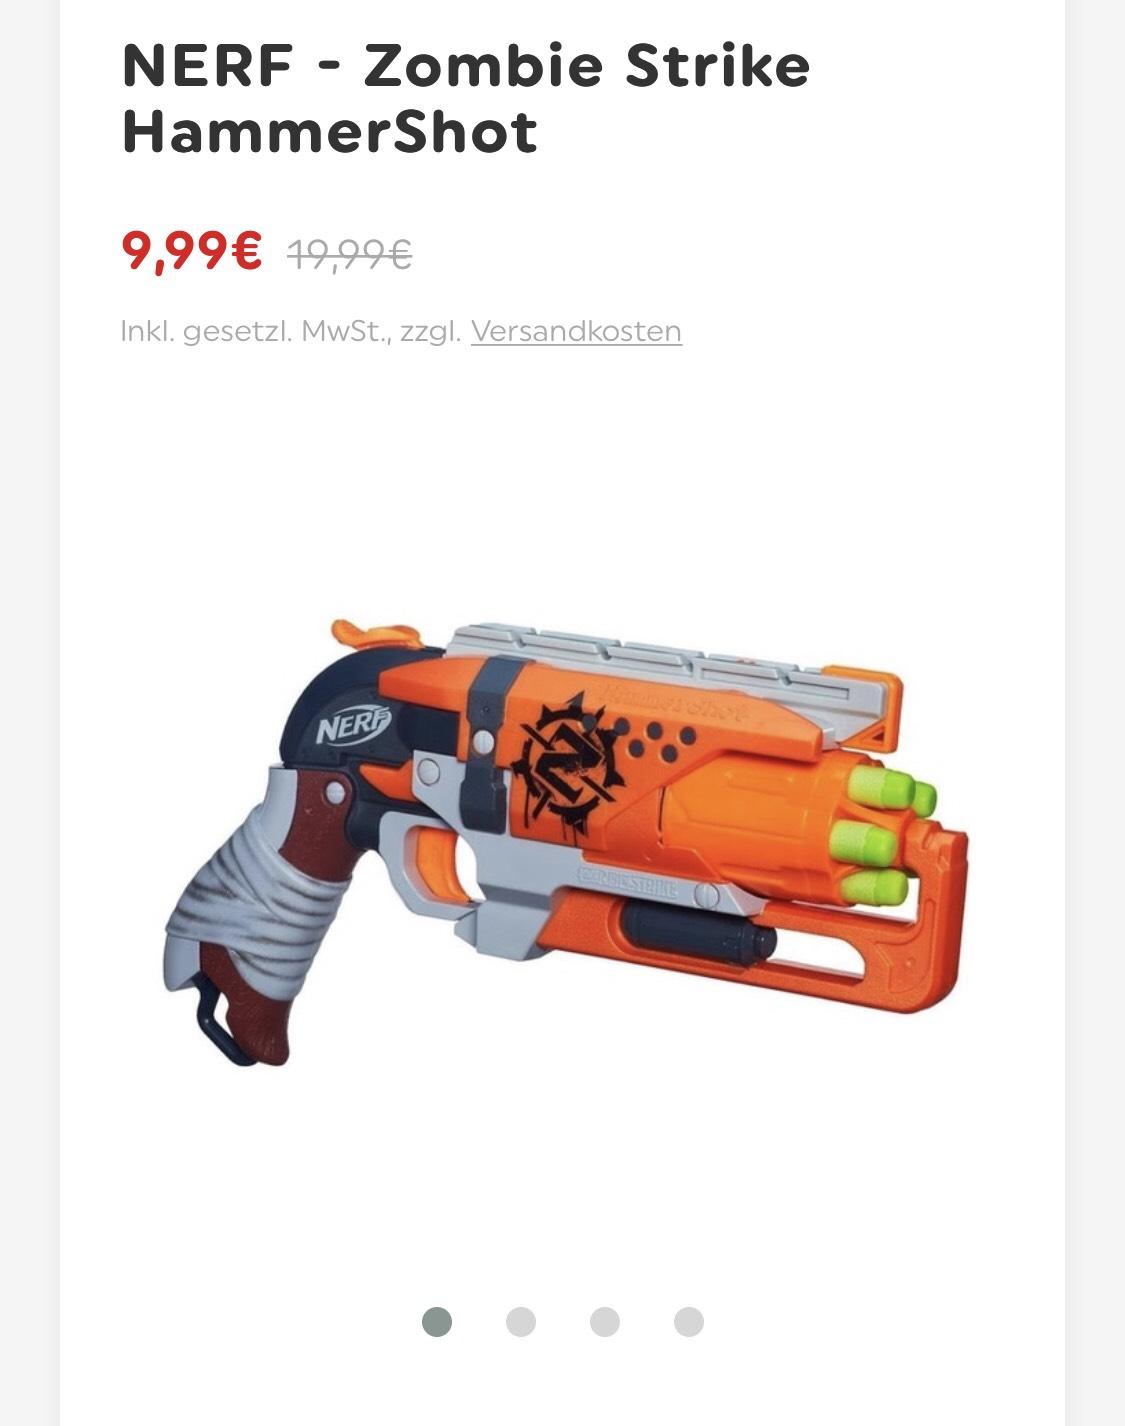 NERF - Zombie Strike HammerShot (SmythsToys) lokal div. Filialen